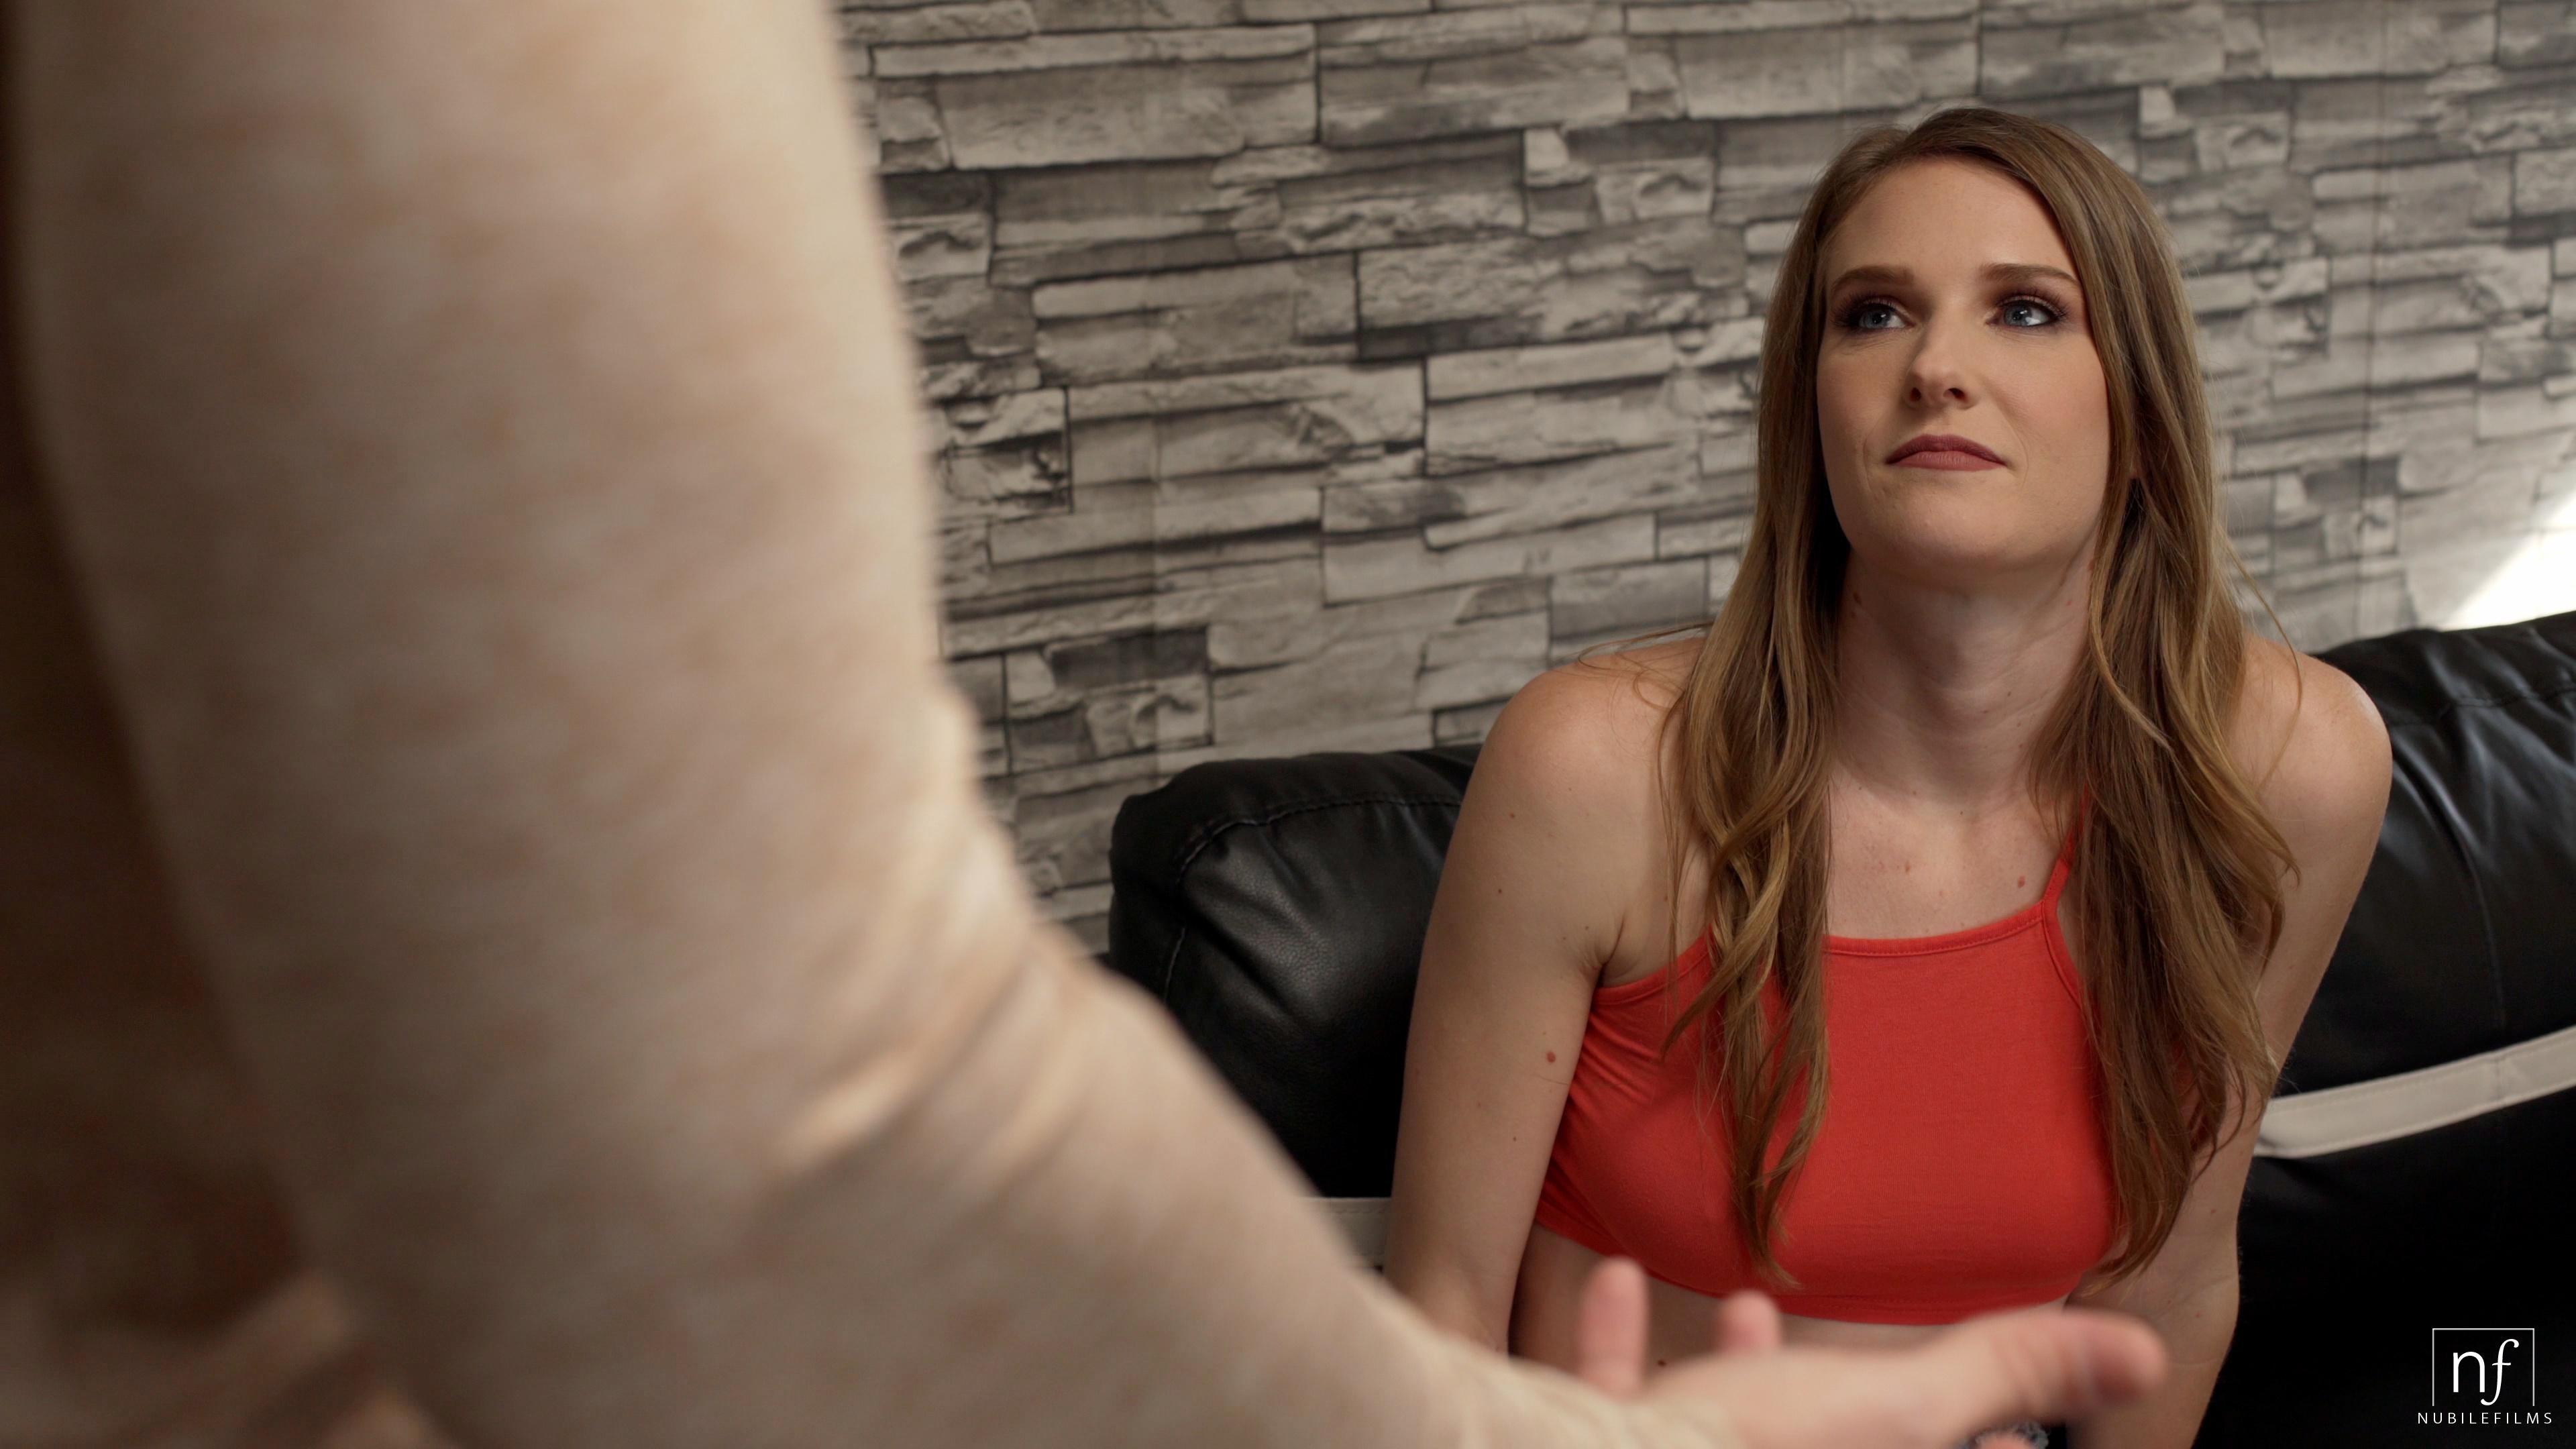 NubileFilms.com - Ashley Lane,Will Pounder: Love Me Like That - S38:E14